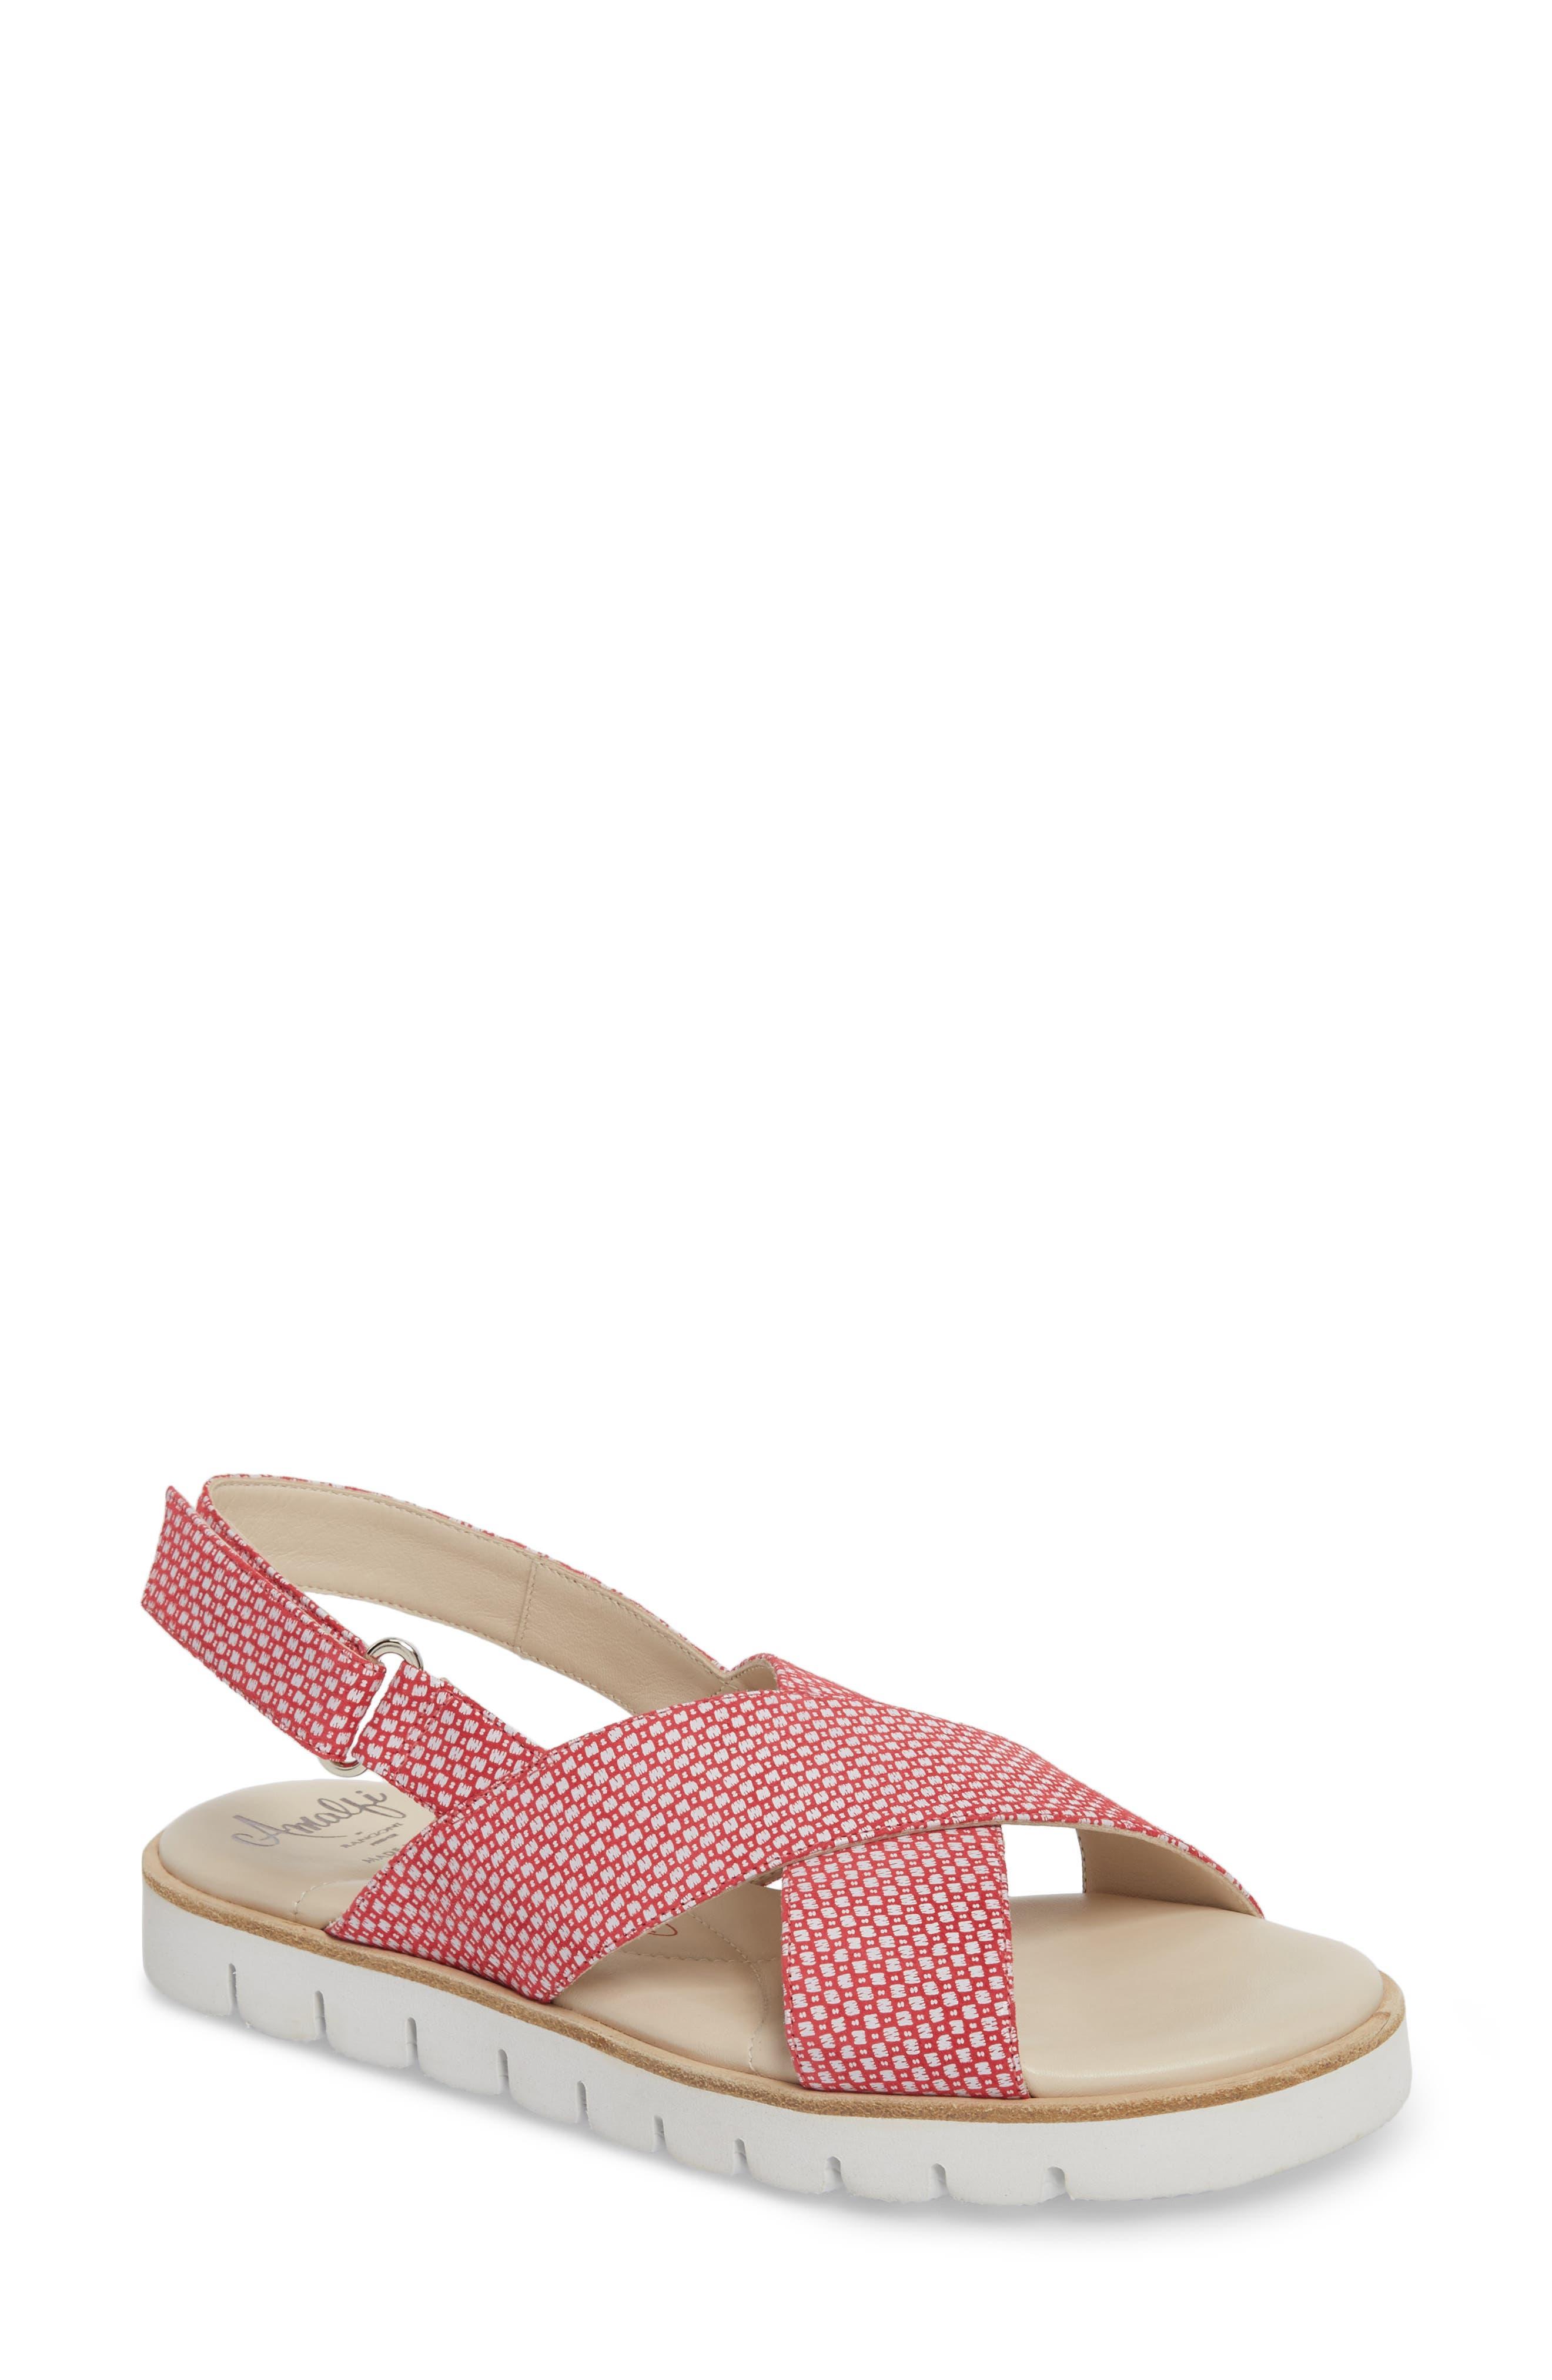 Borgo Sandal,                             Main thumbnail 1, color,                             Red/ White Leather